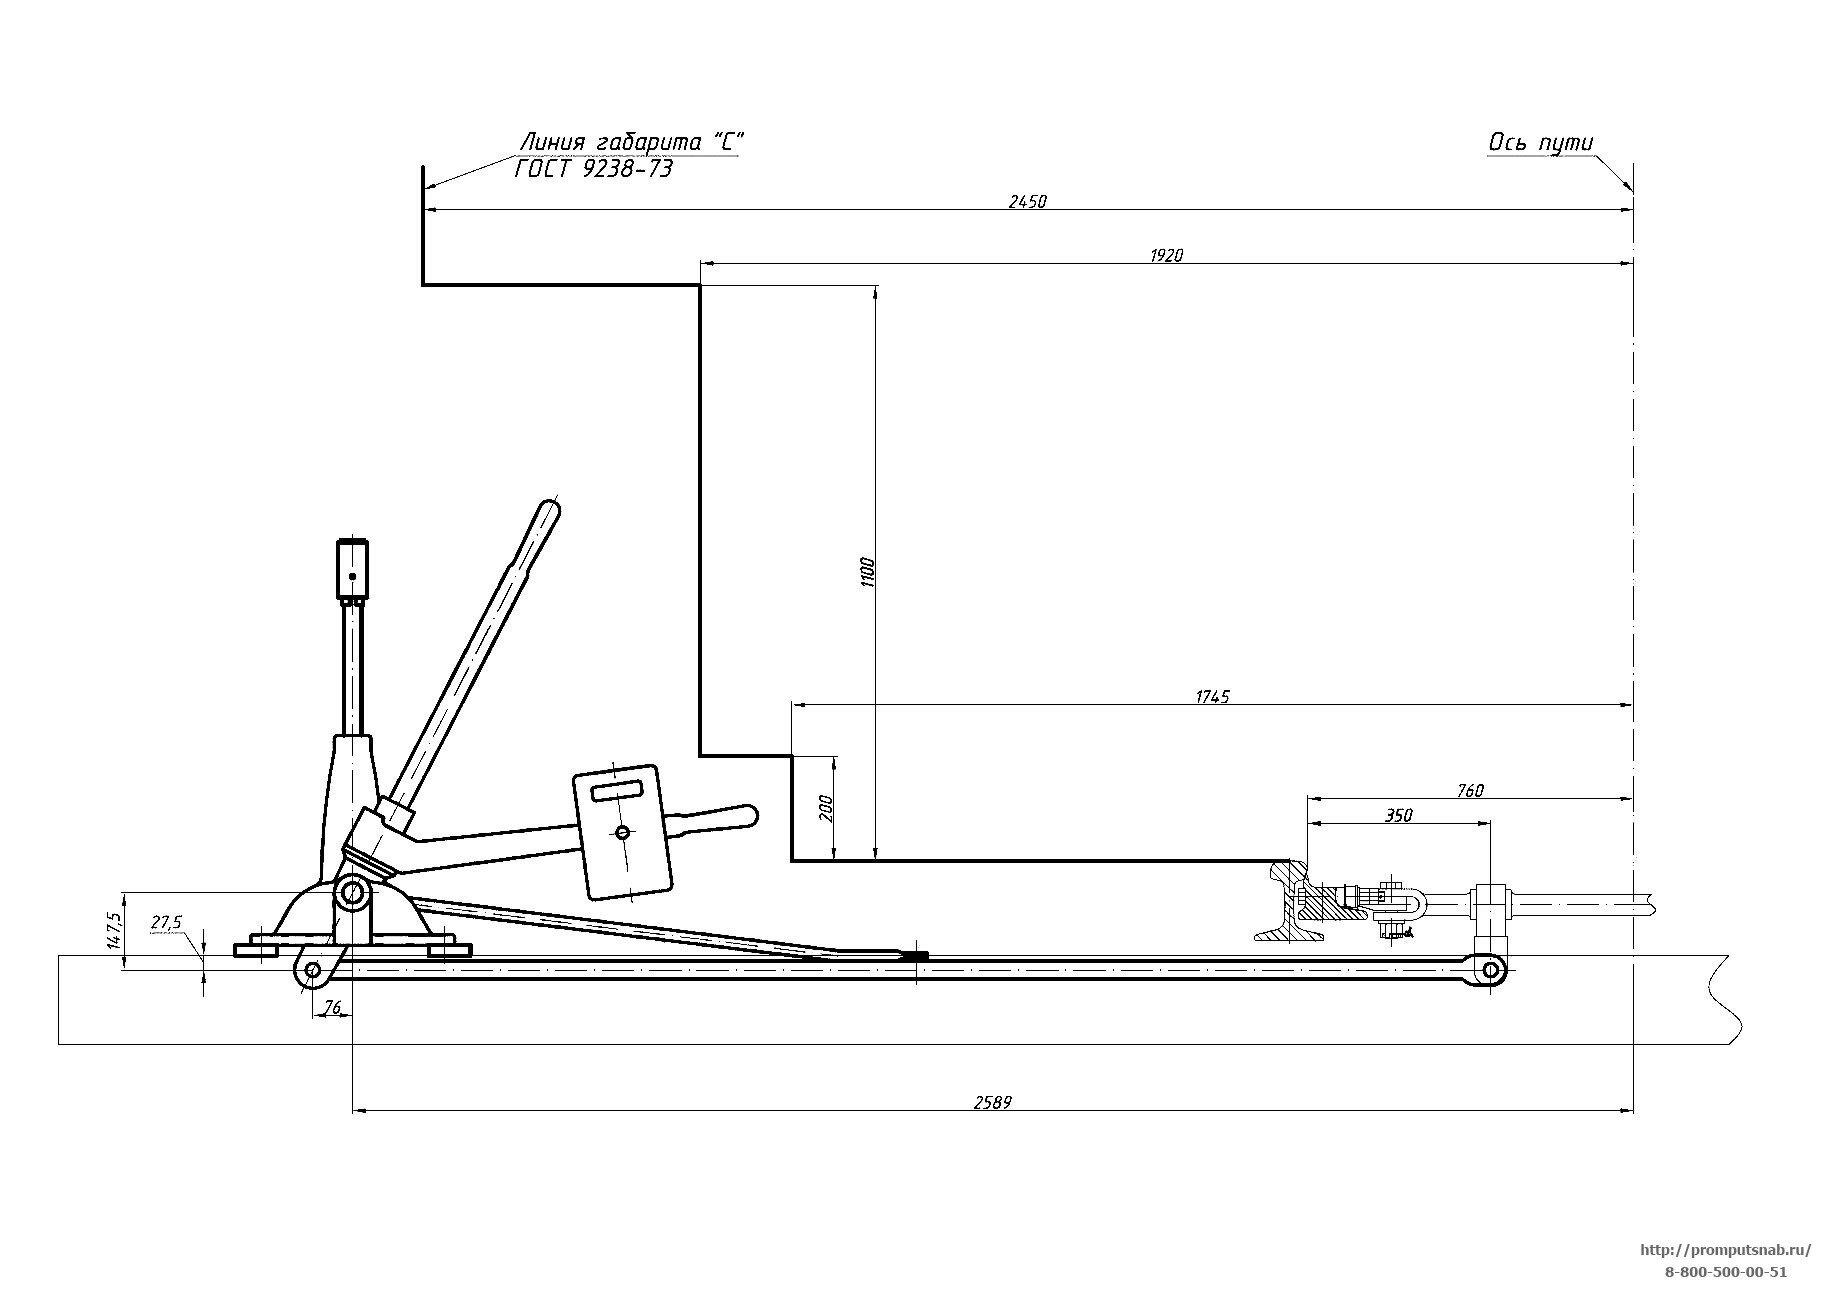 Механизм переводной проект 1709 (флюгарка) - фото pic_b5a893a8e829040445bb5dbf08e7f314_1920x9000_1.jpg